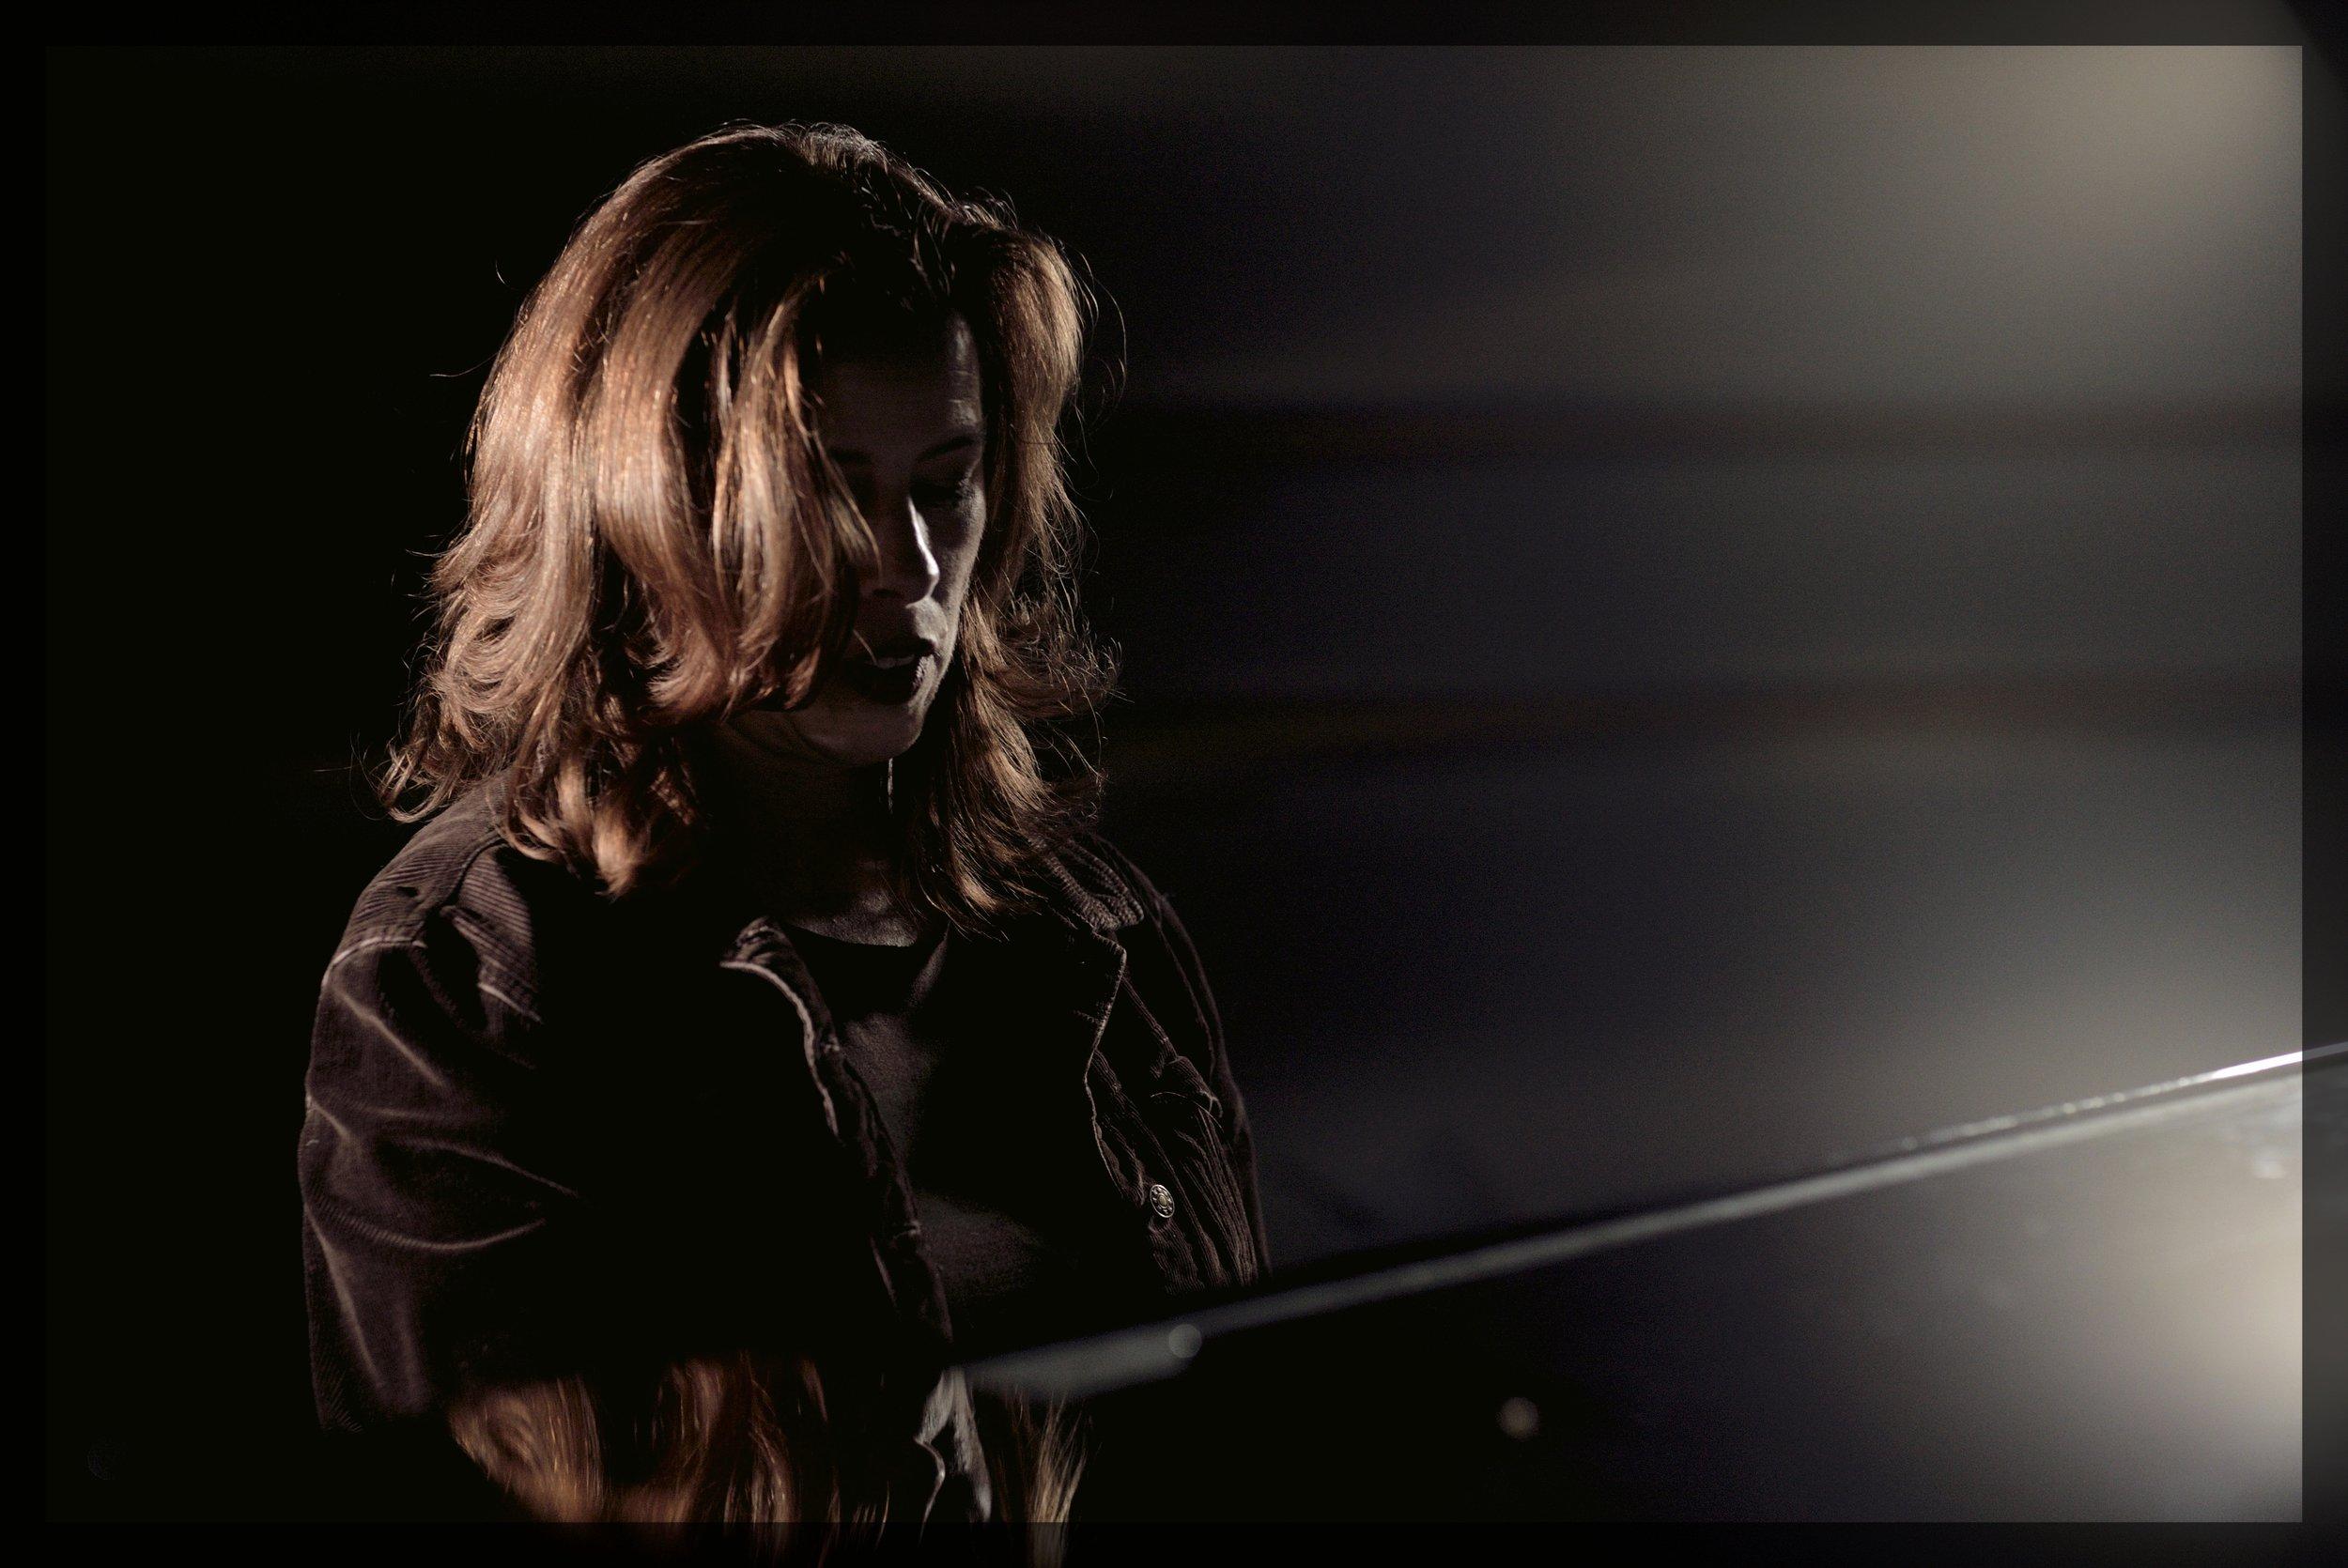 Rebecca Harrold Performance poster 2 fotor_Fotor.jpg